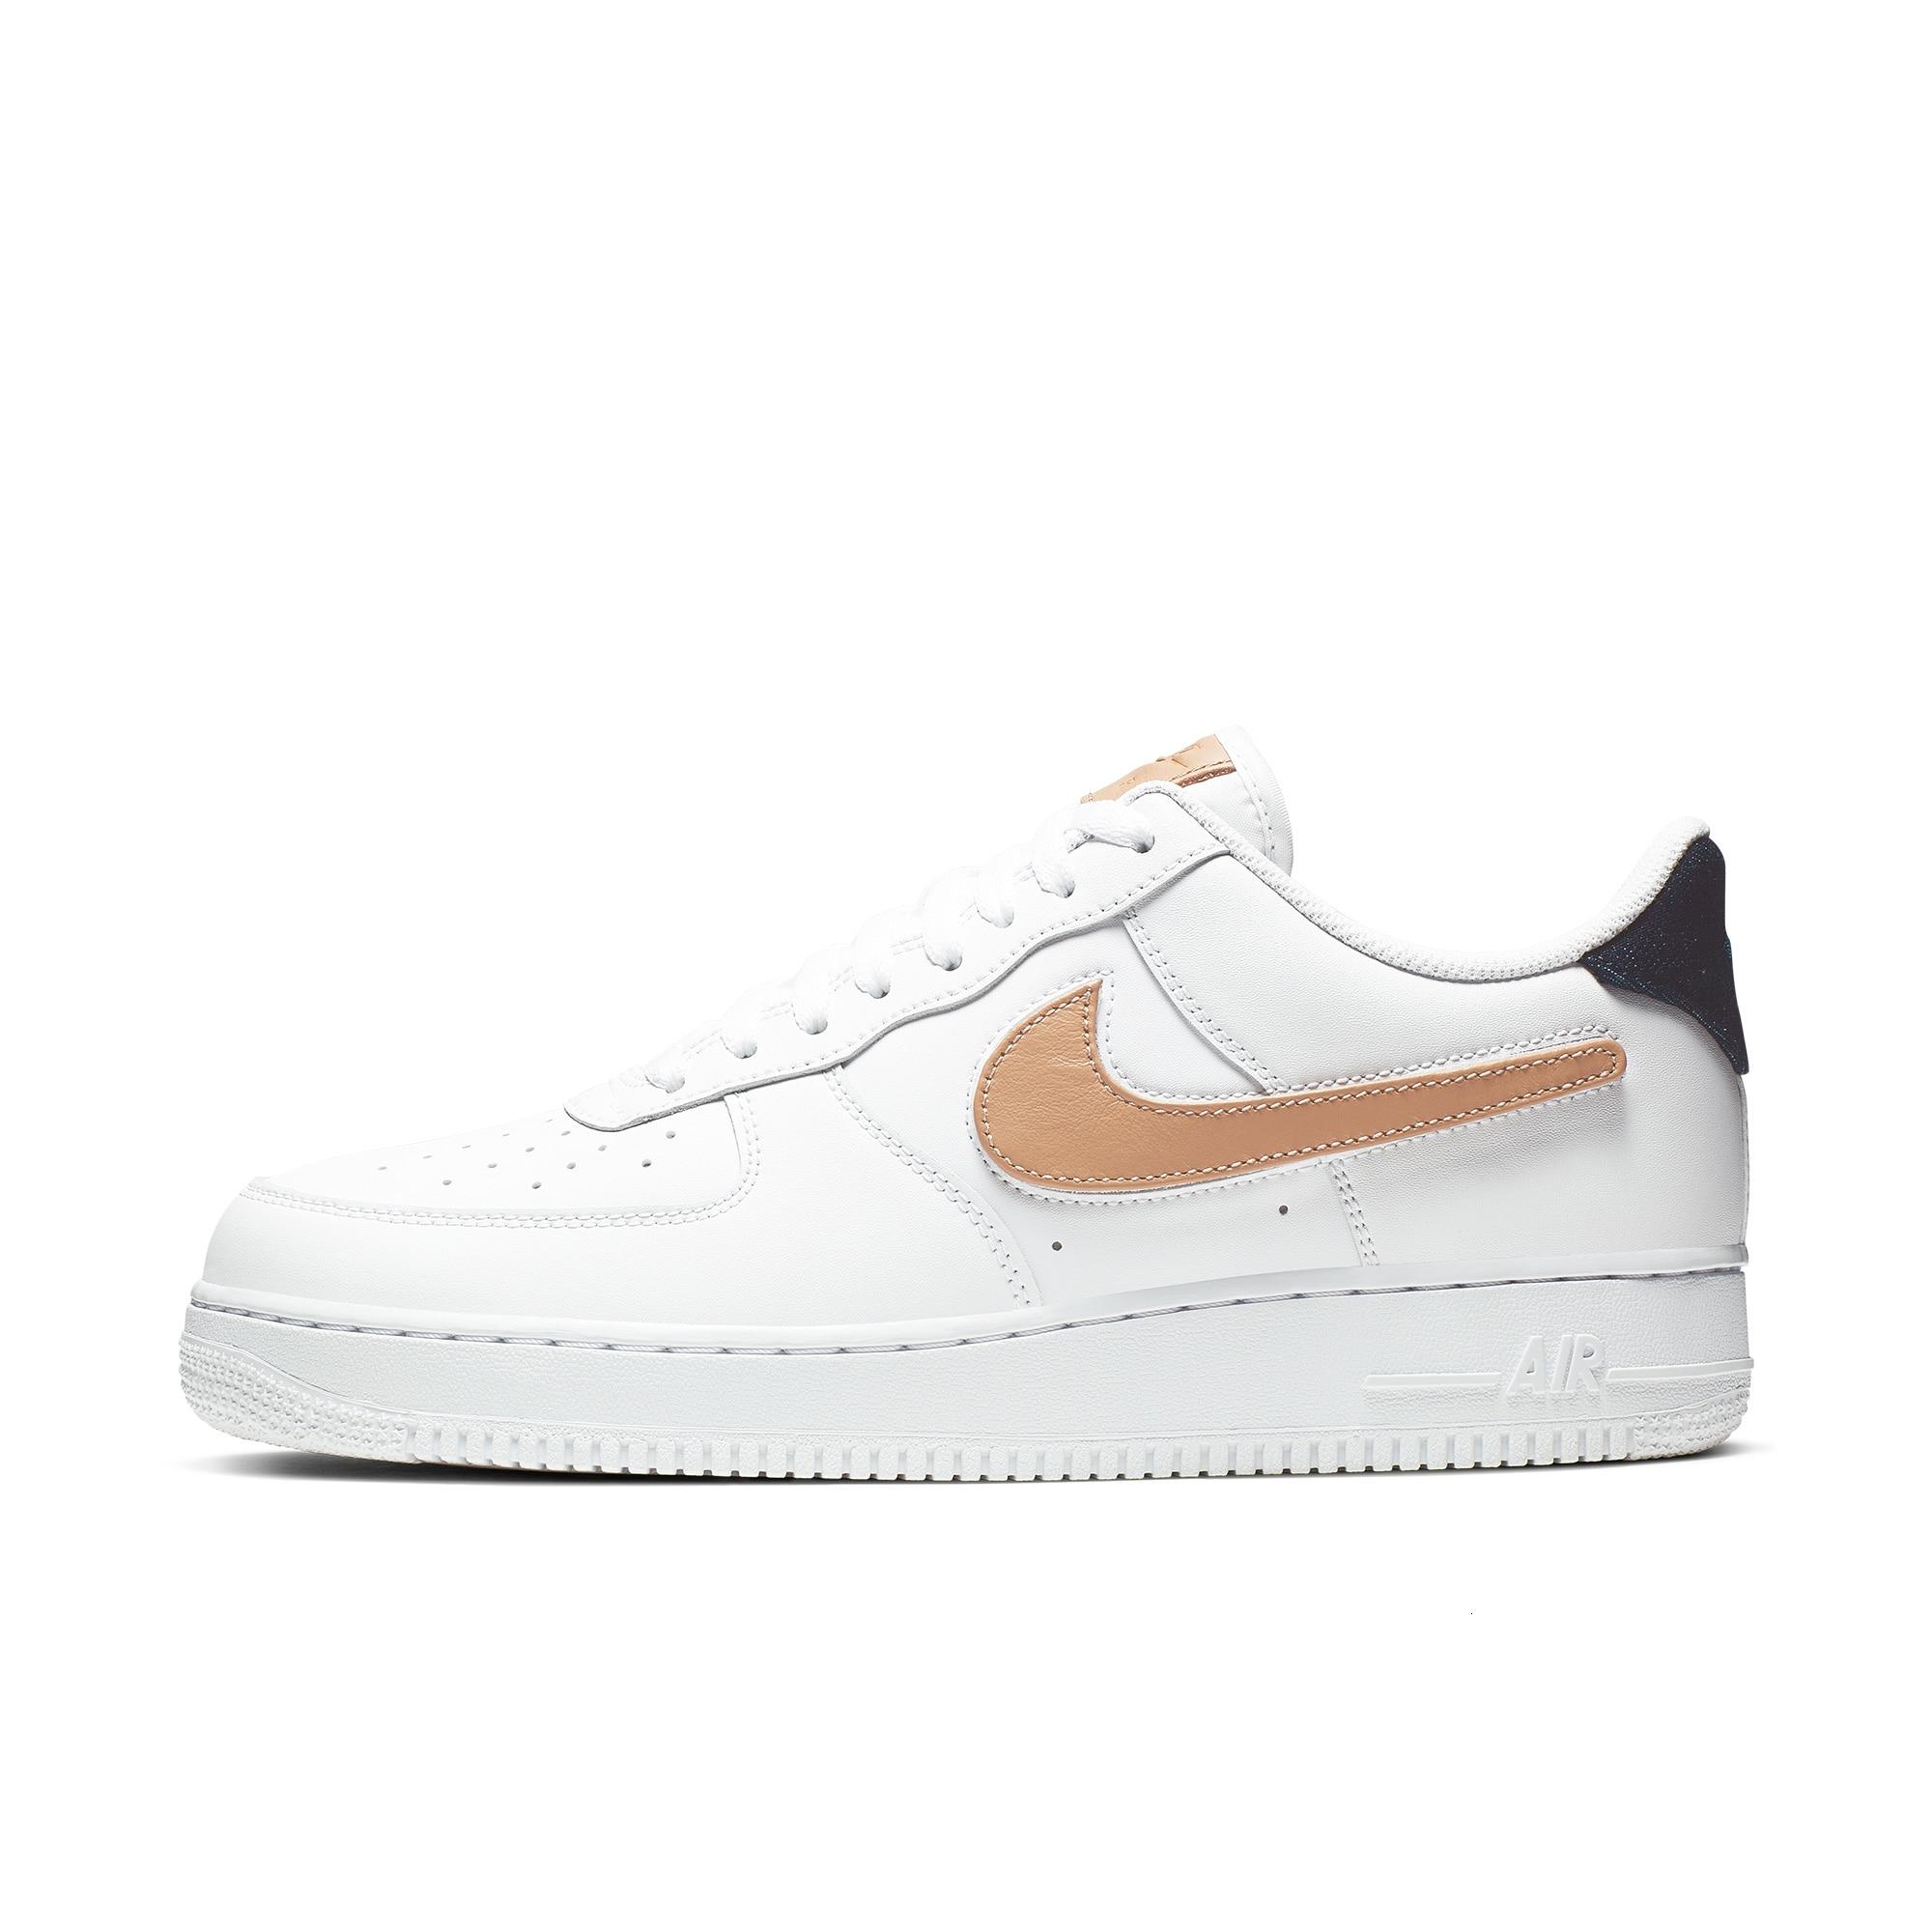 Oryginalny Buty Nike Air Force 1 '07 3 Męskie, Trampki Nike